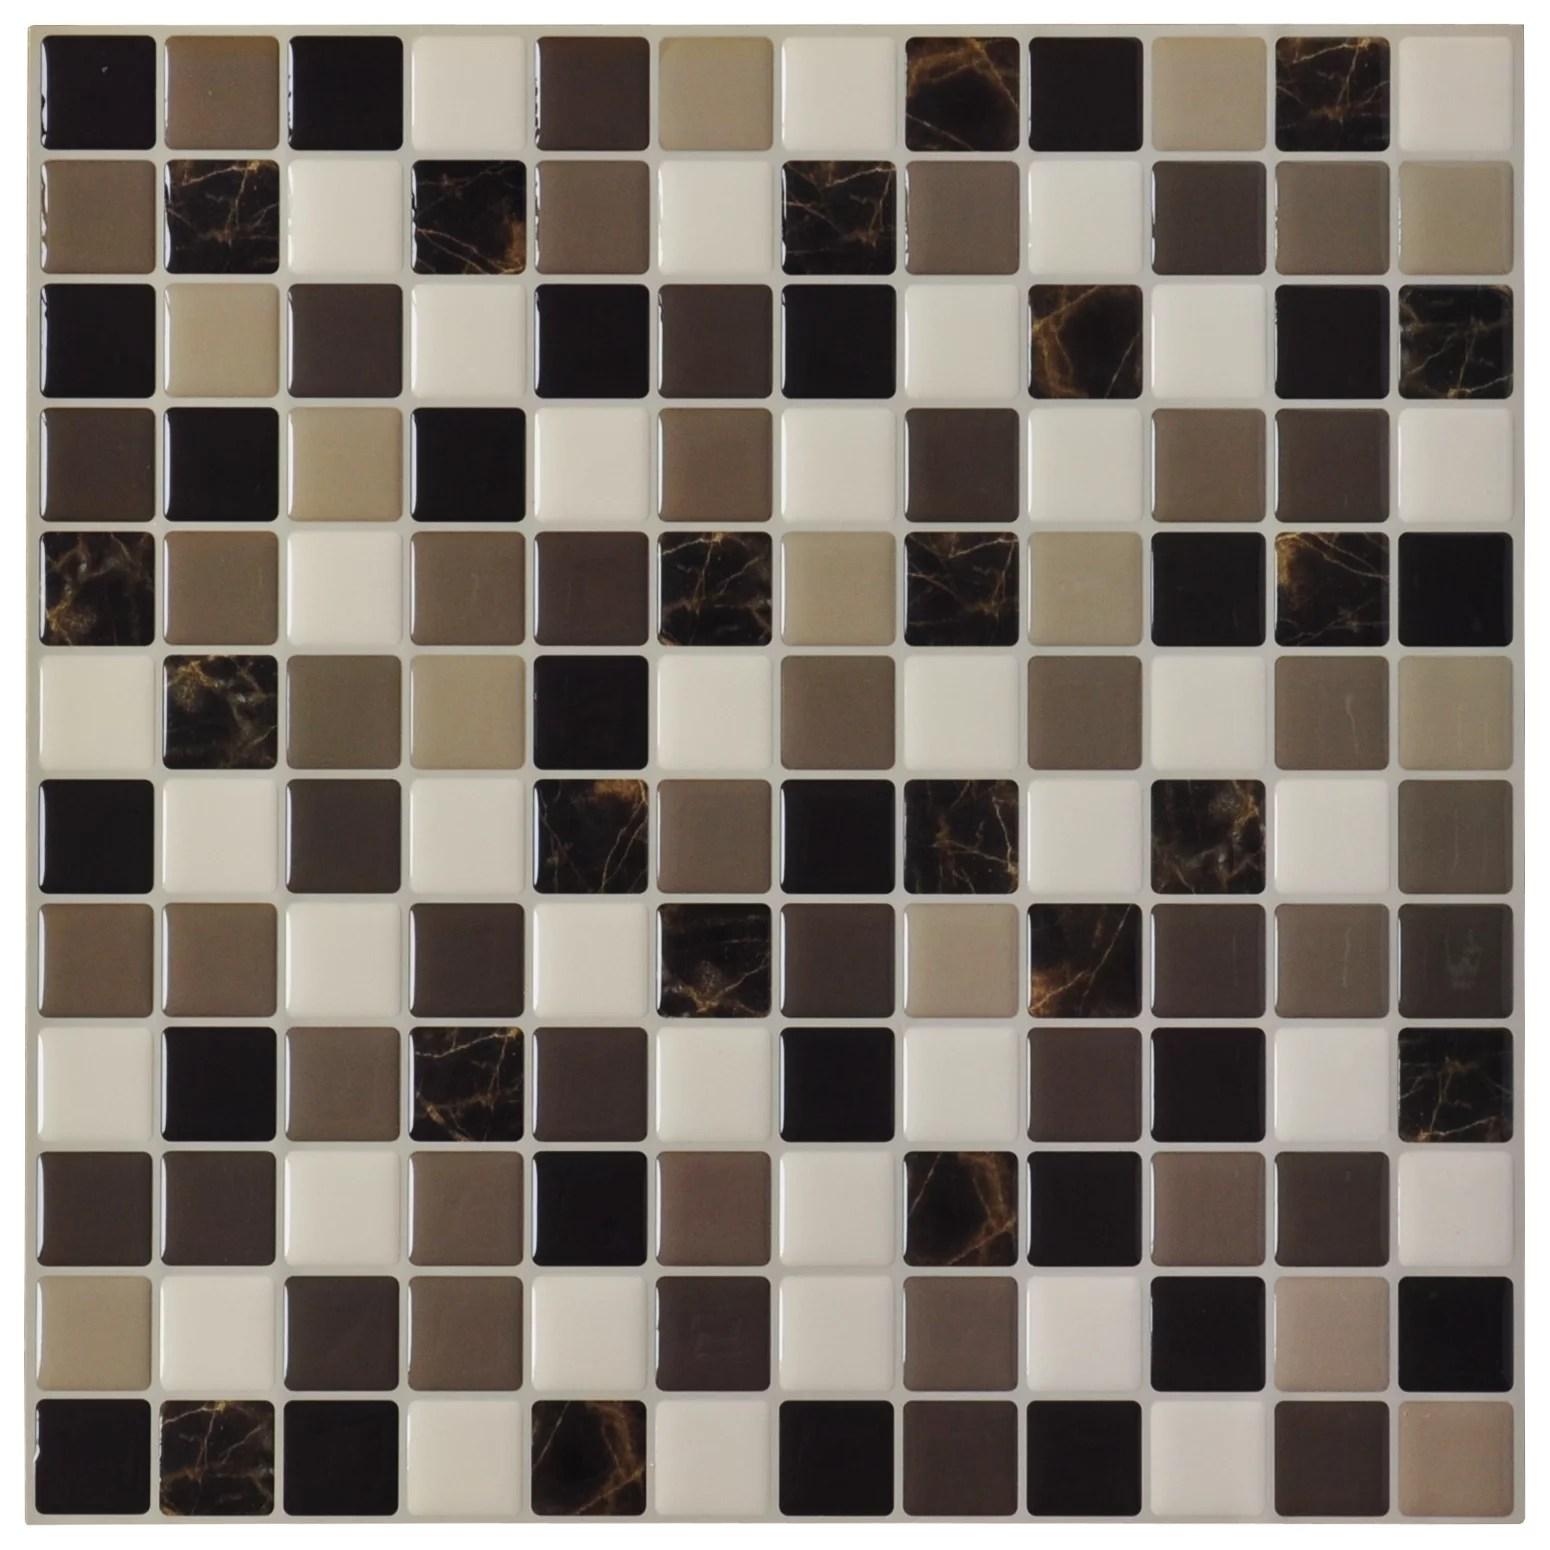 stick on backsplash tiles for kitchen cabinet refinishing ct art3d 6 pack tile marble square peel and 12 x walmart com